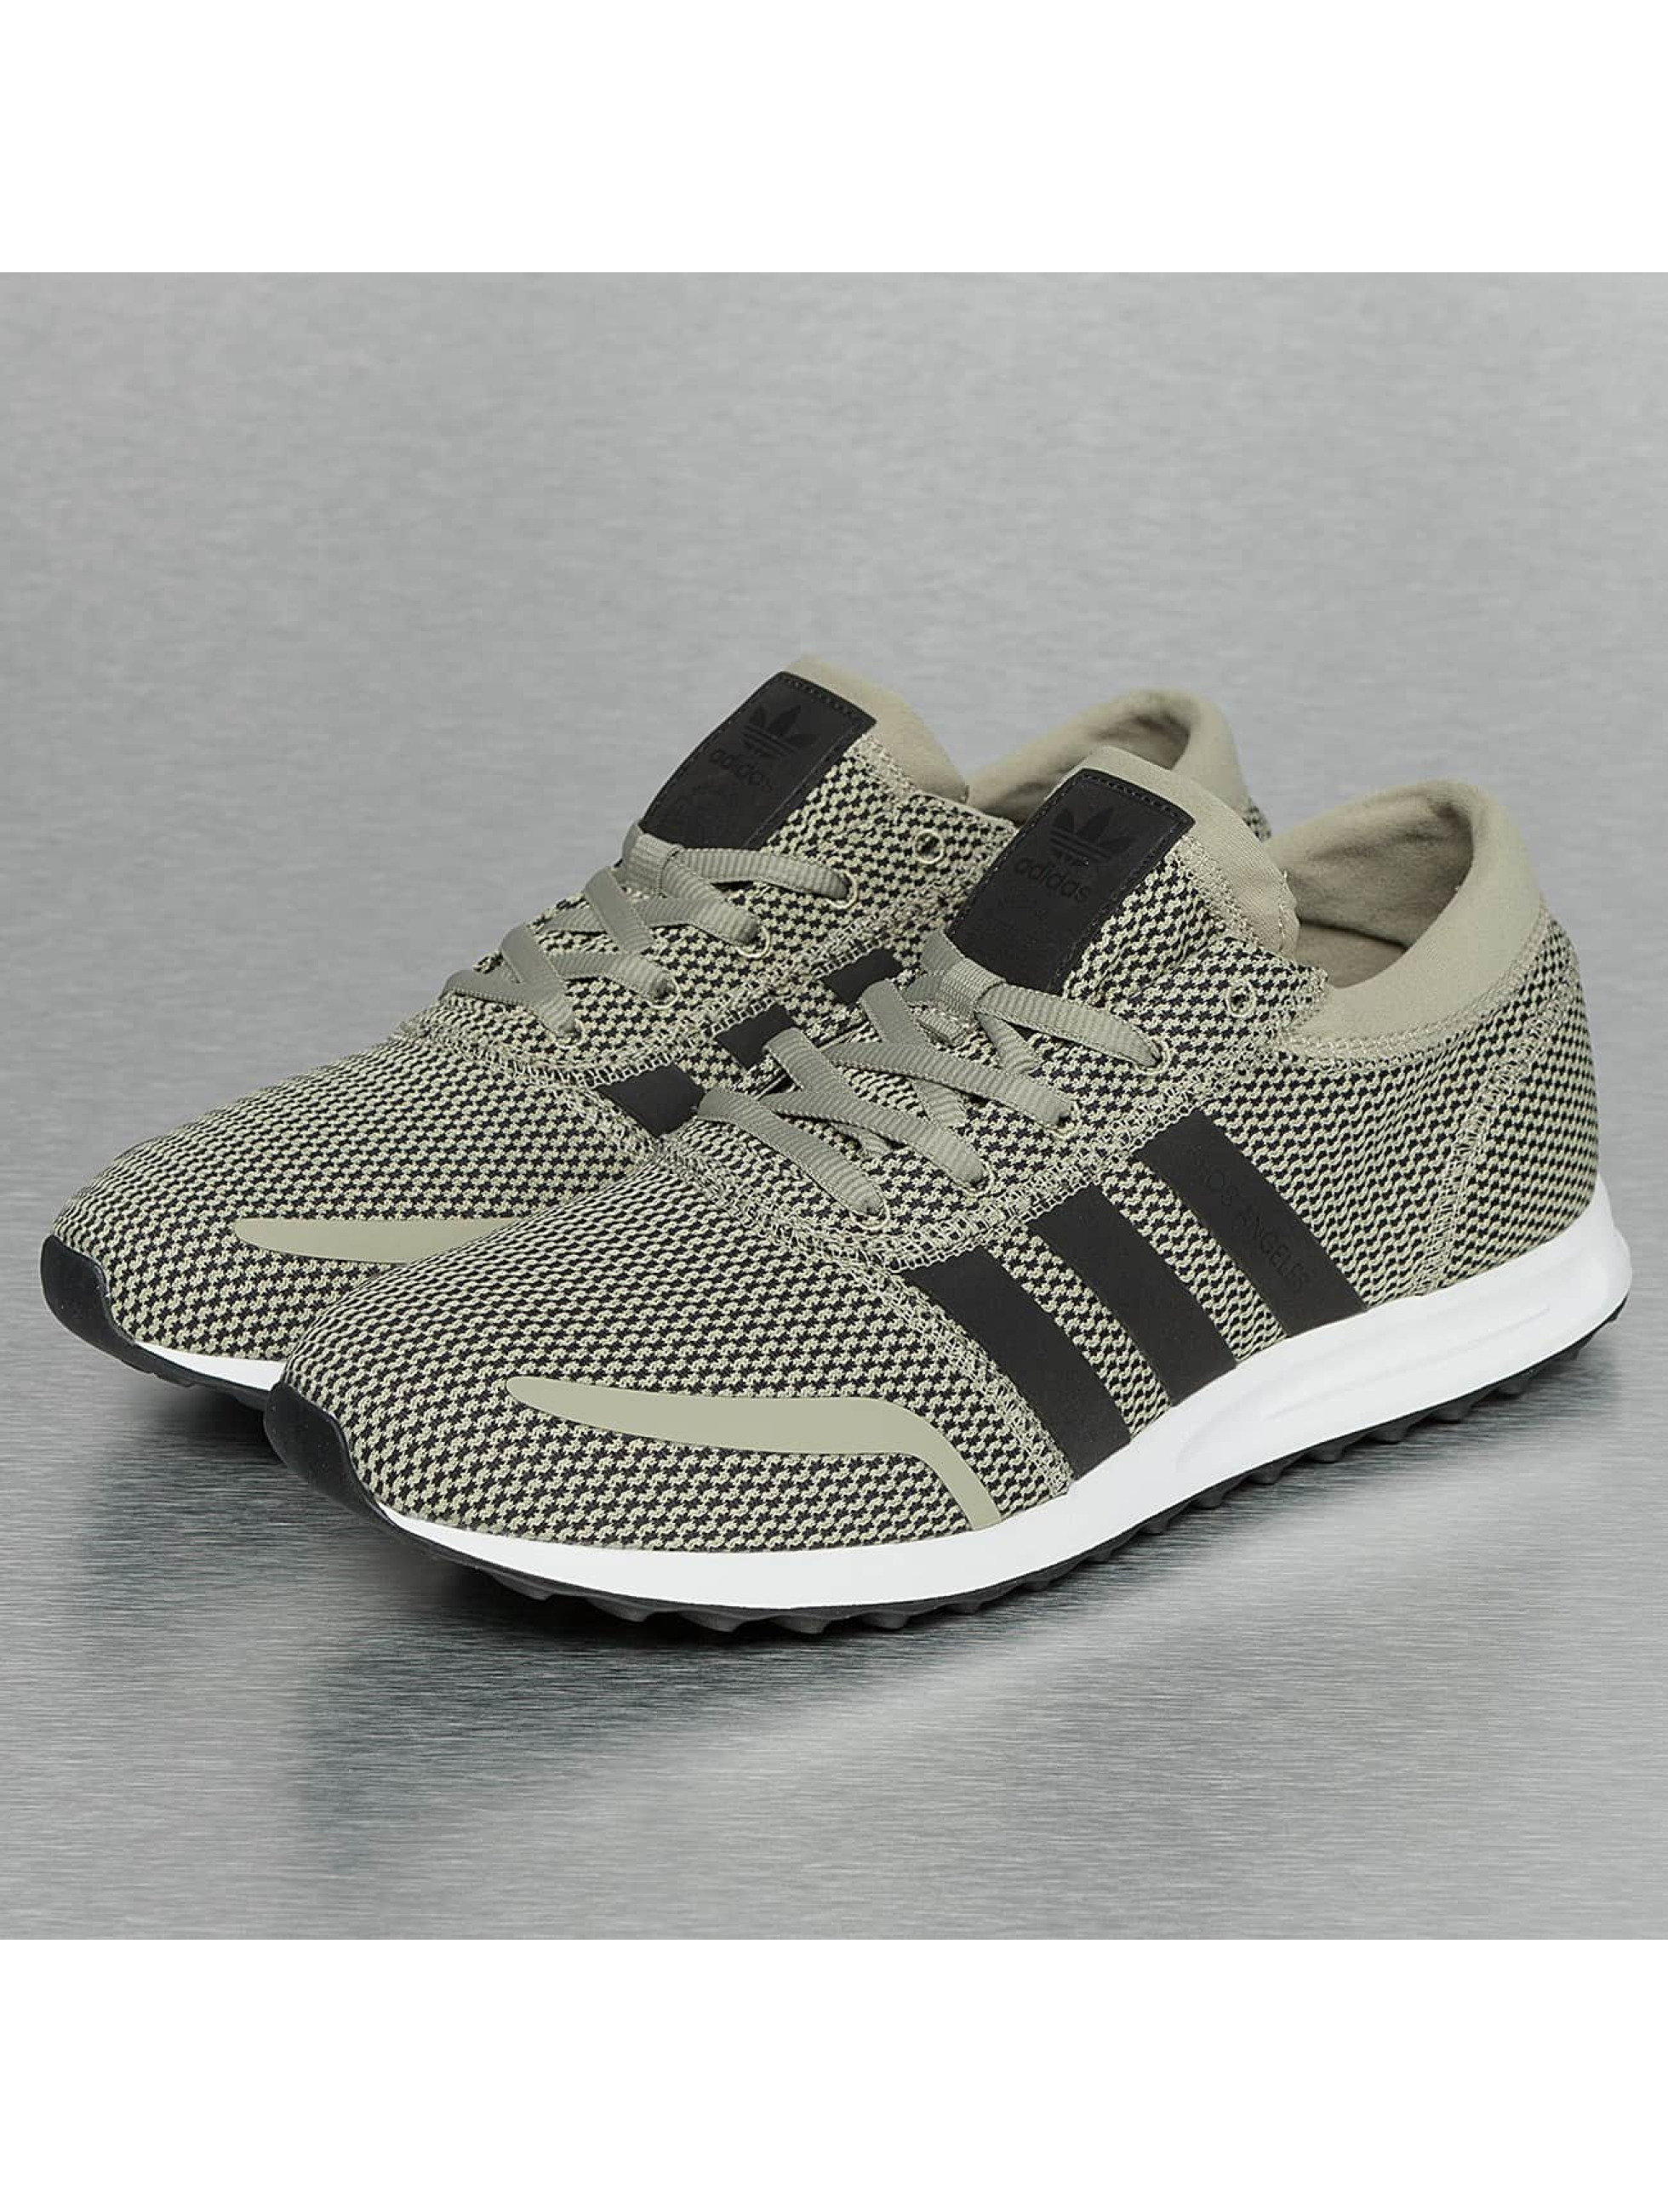 adidas originals schoen sneaker los angeles in beige 302813. Black Bedroom Furniture Sets. Home Design Ideas